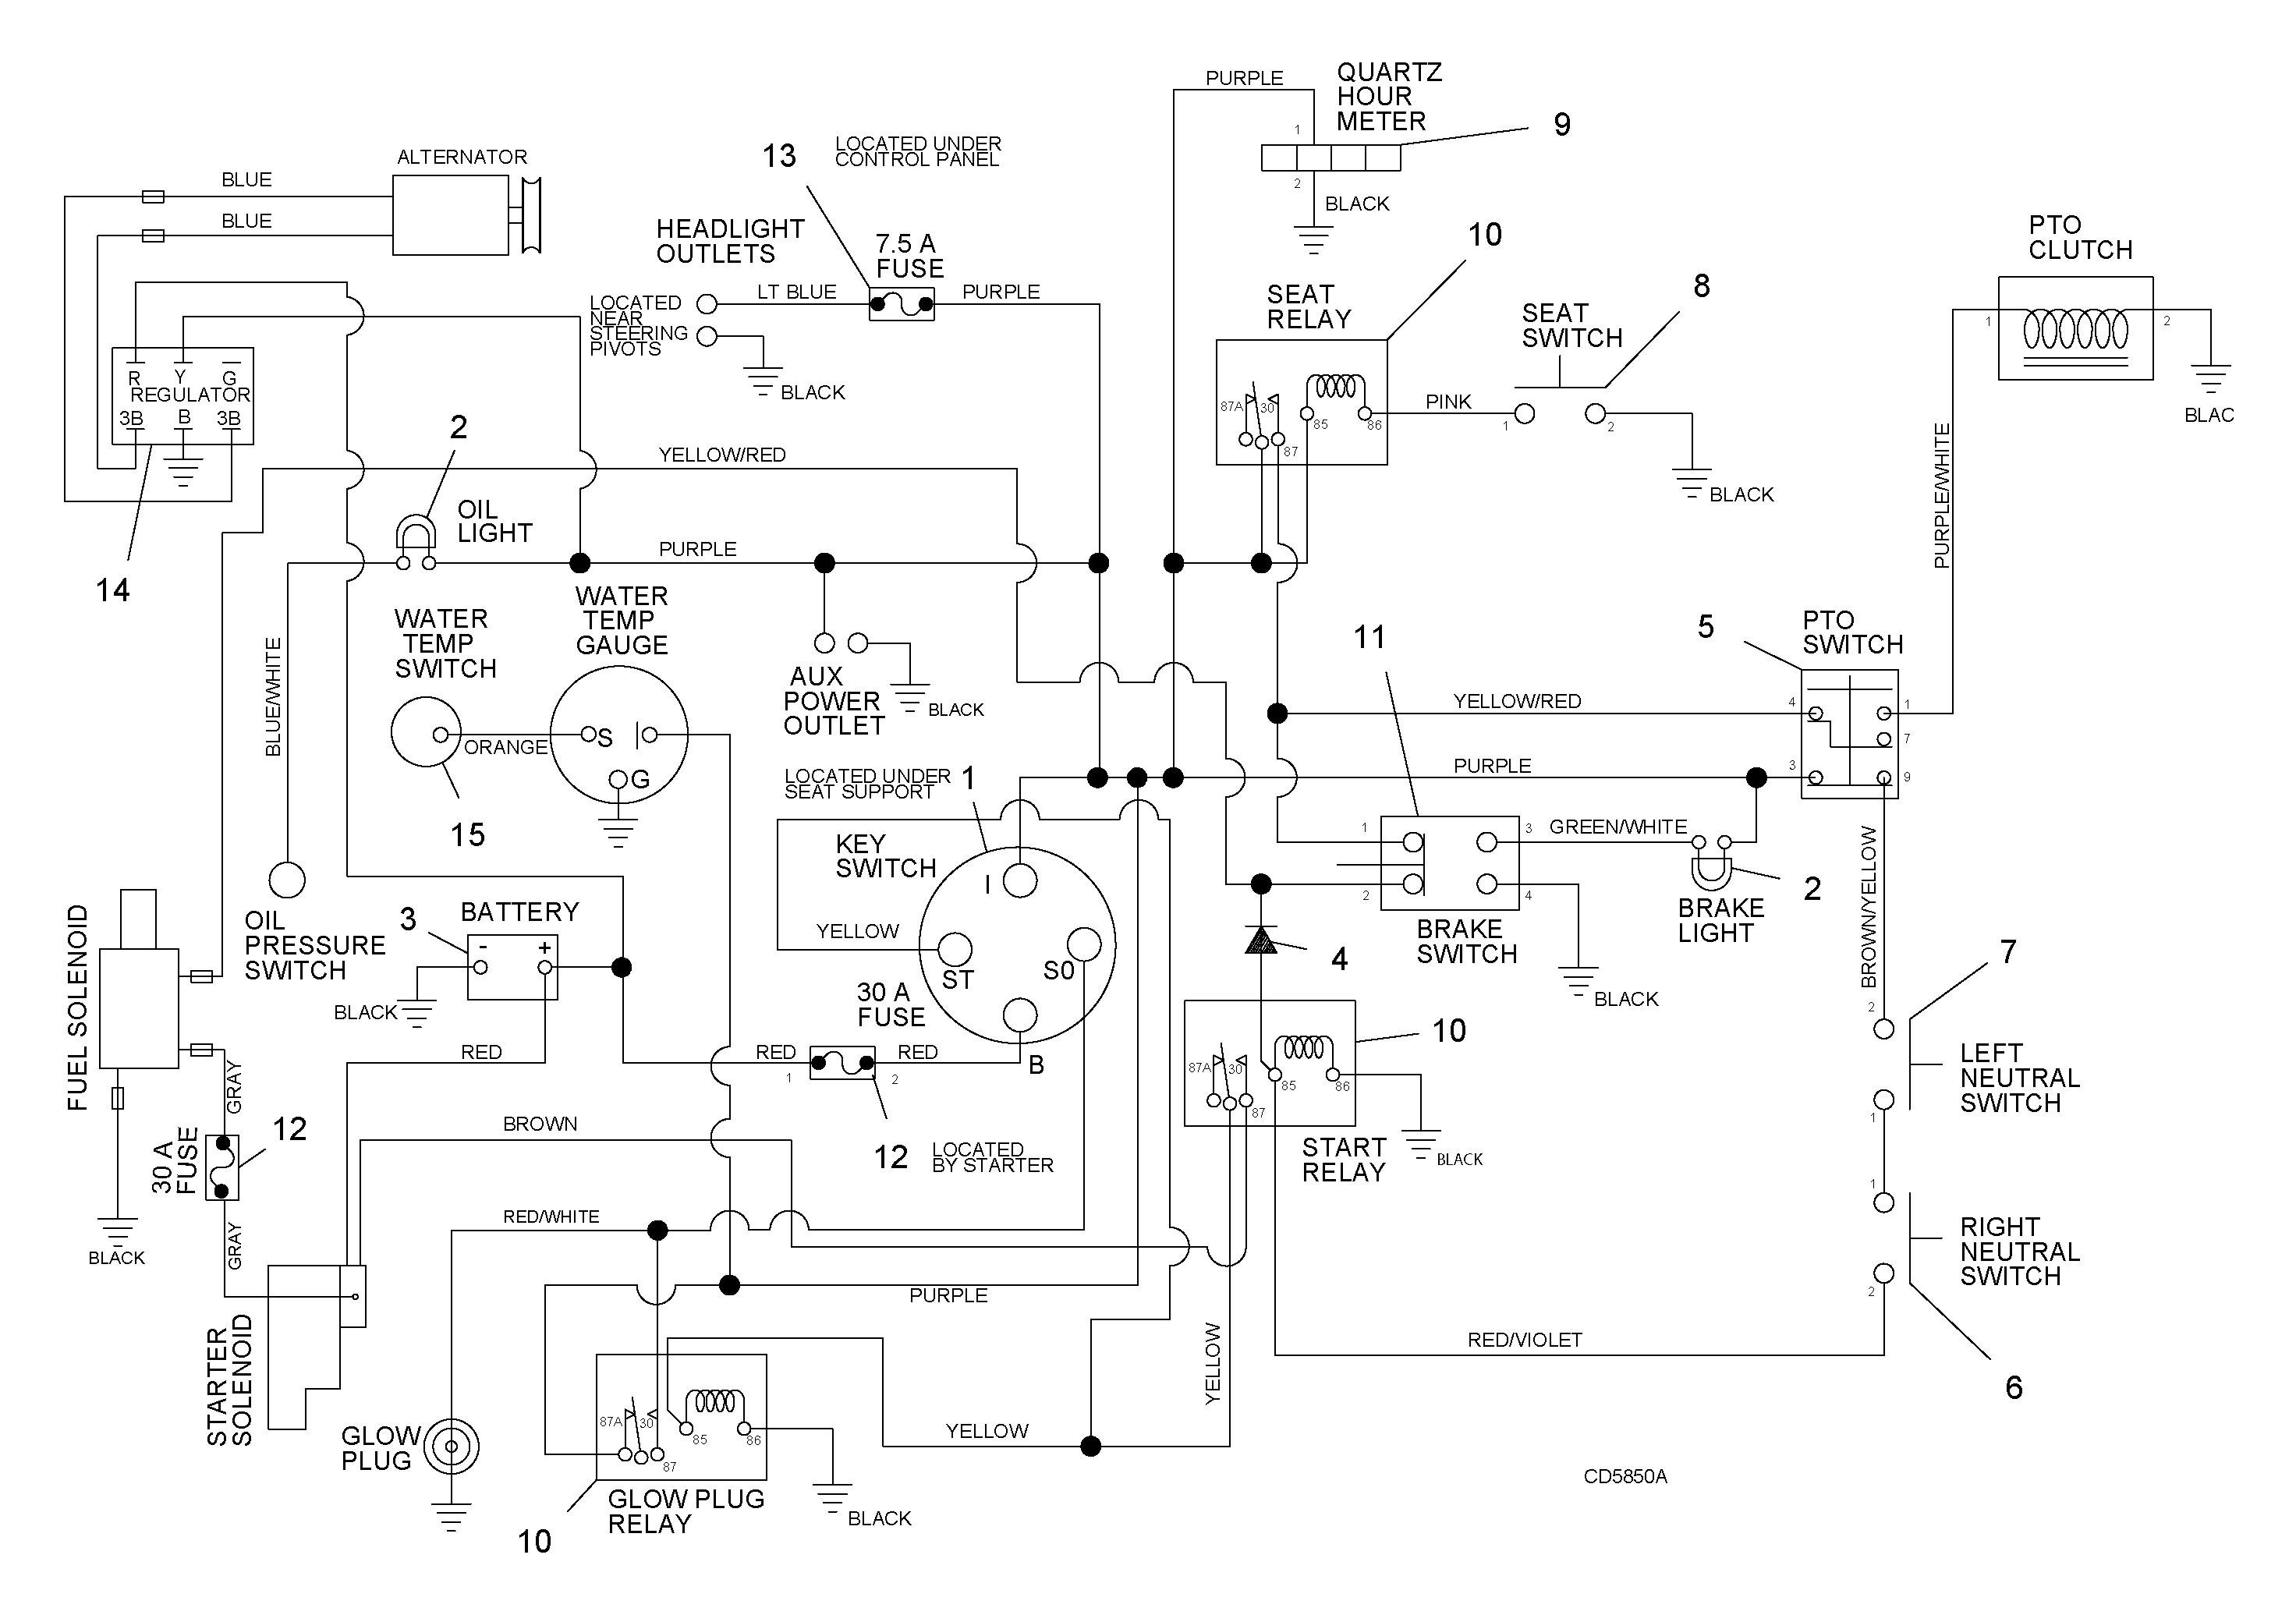 toro 580d wiring diagram